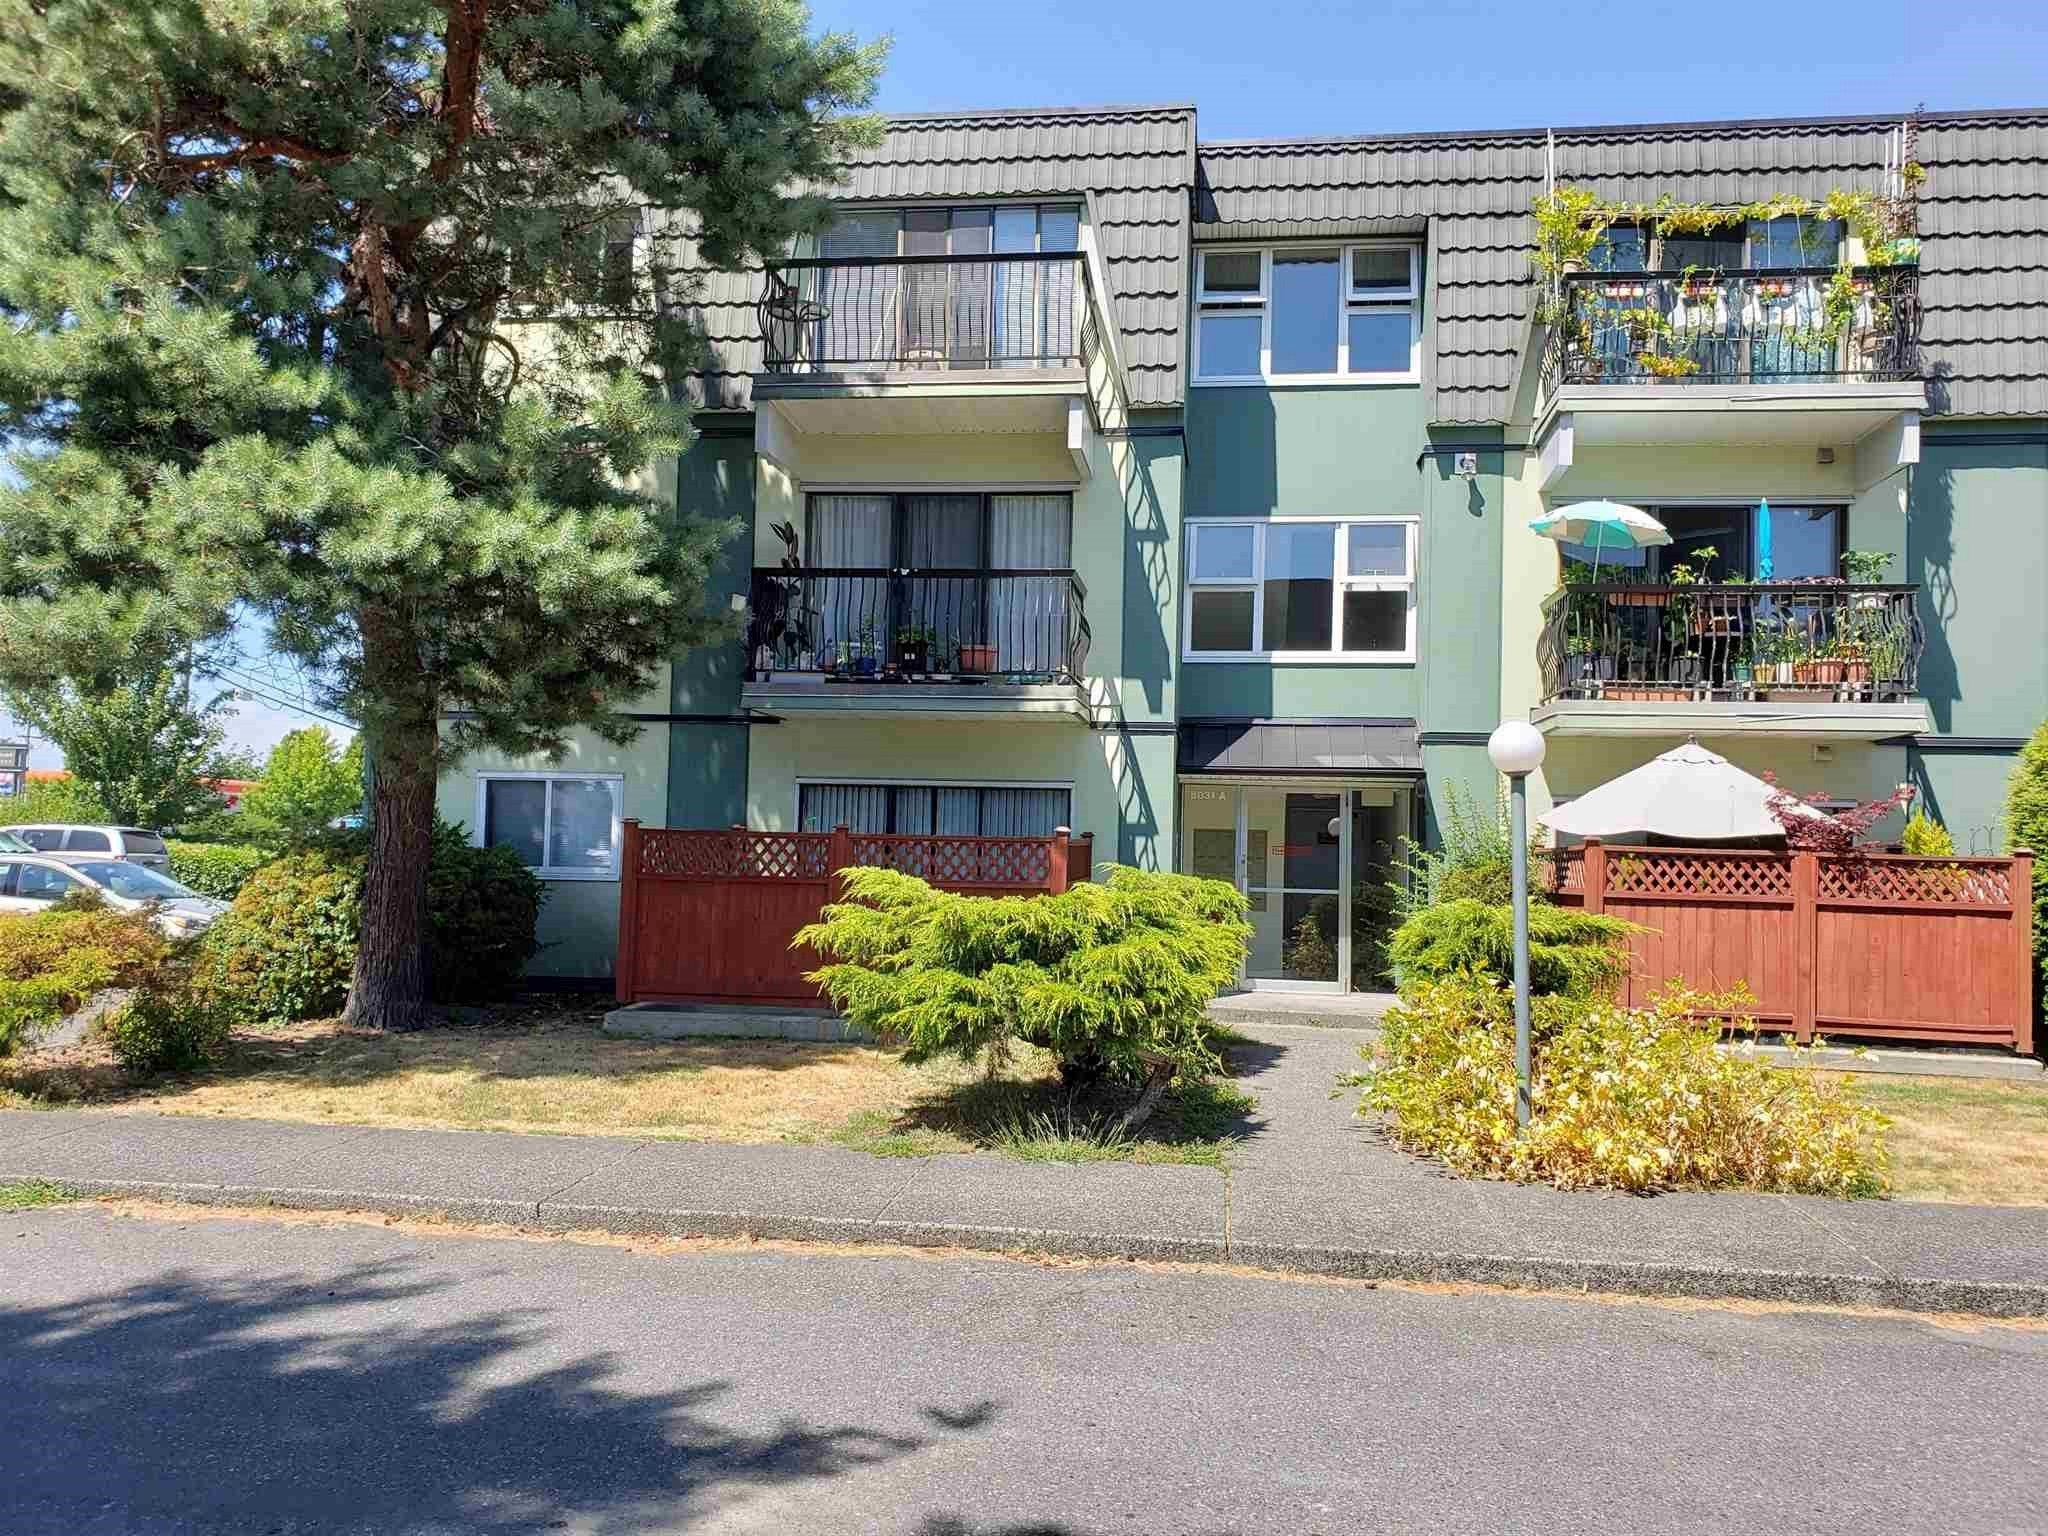 313 8031 RYAN ROAD - South Arm Apartment/Condo for sale, 1 Bedroom (R2601114)